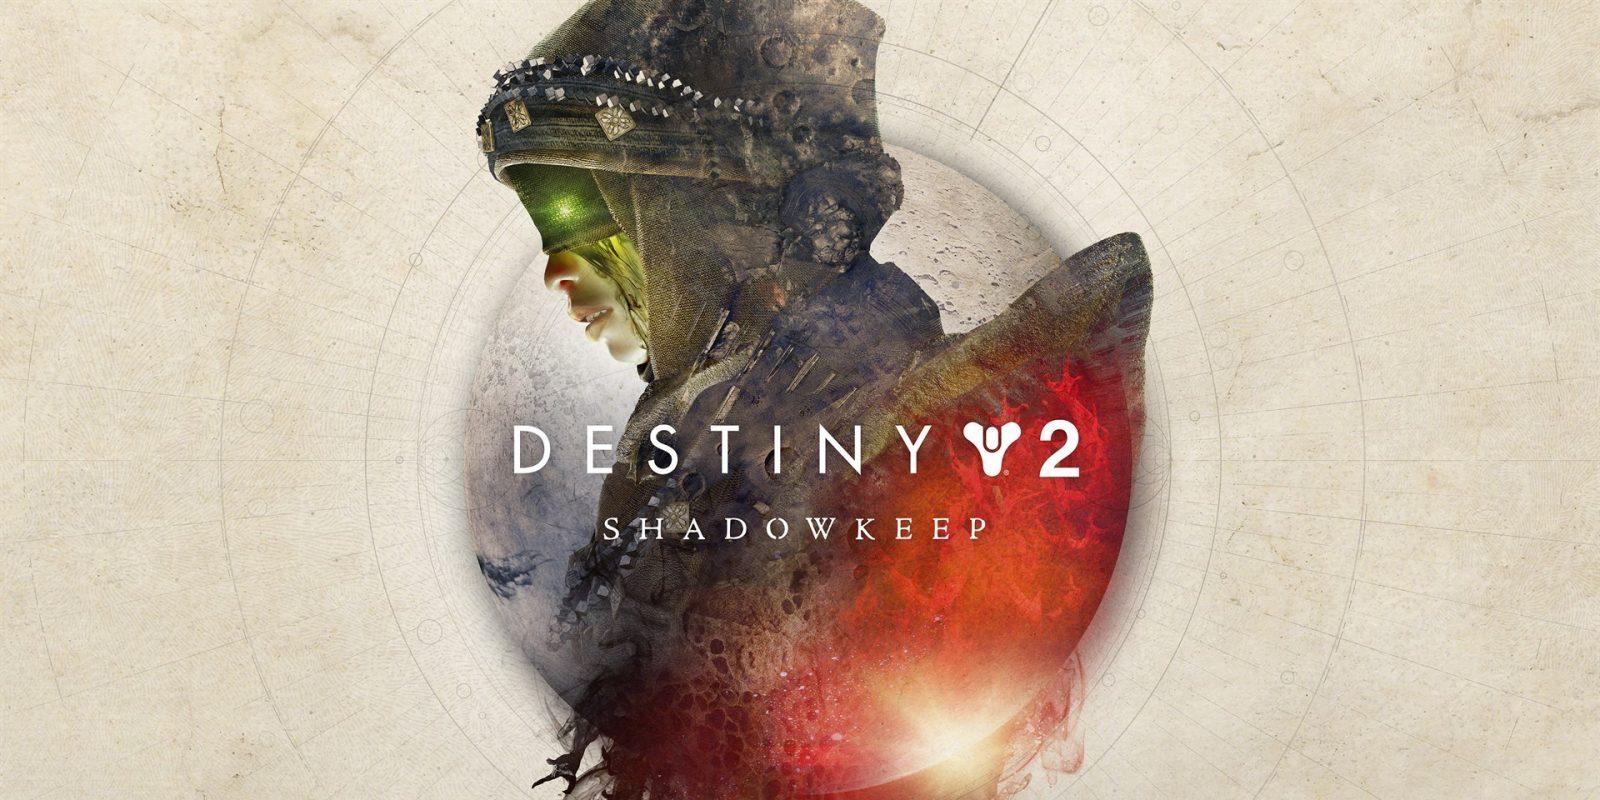 Today's Best Game Deals: Destiny 2 Shadowkeep $23.50, God of War $8, more